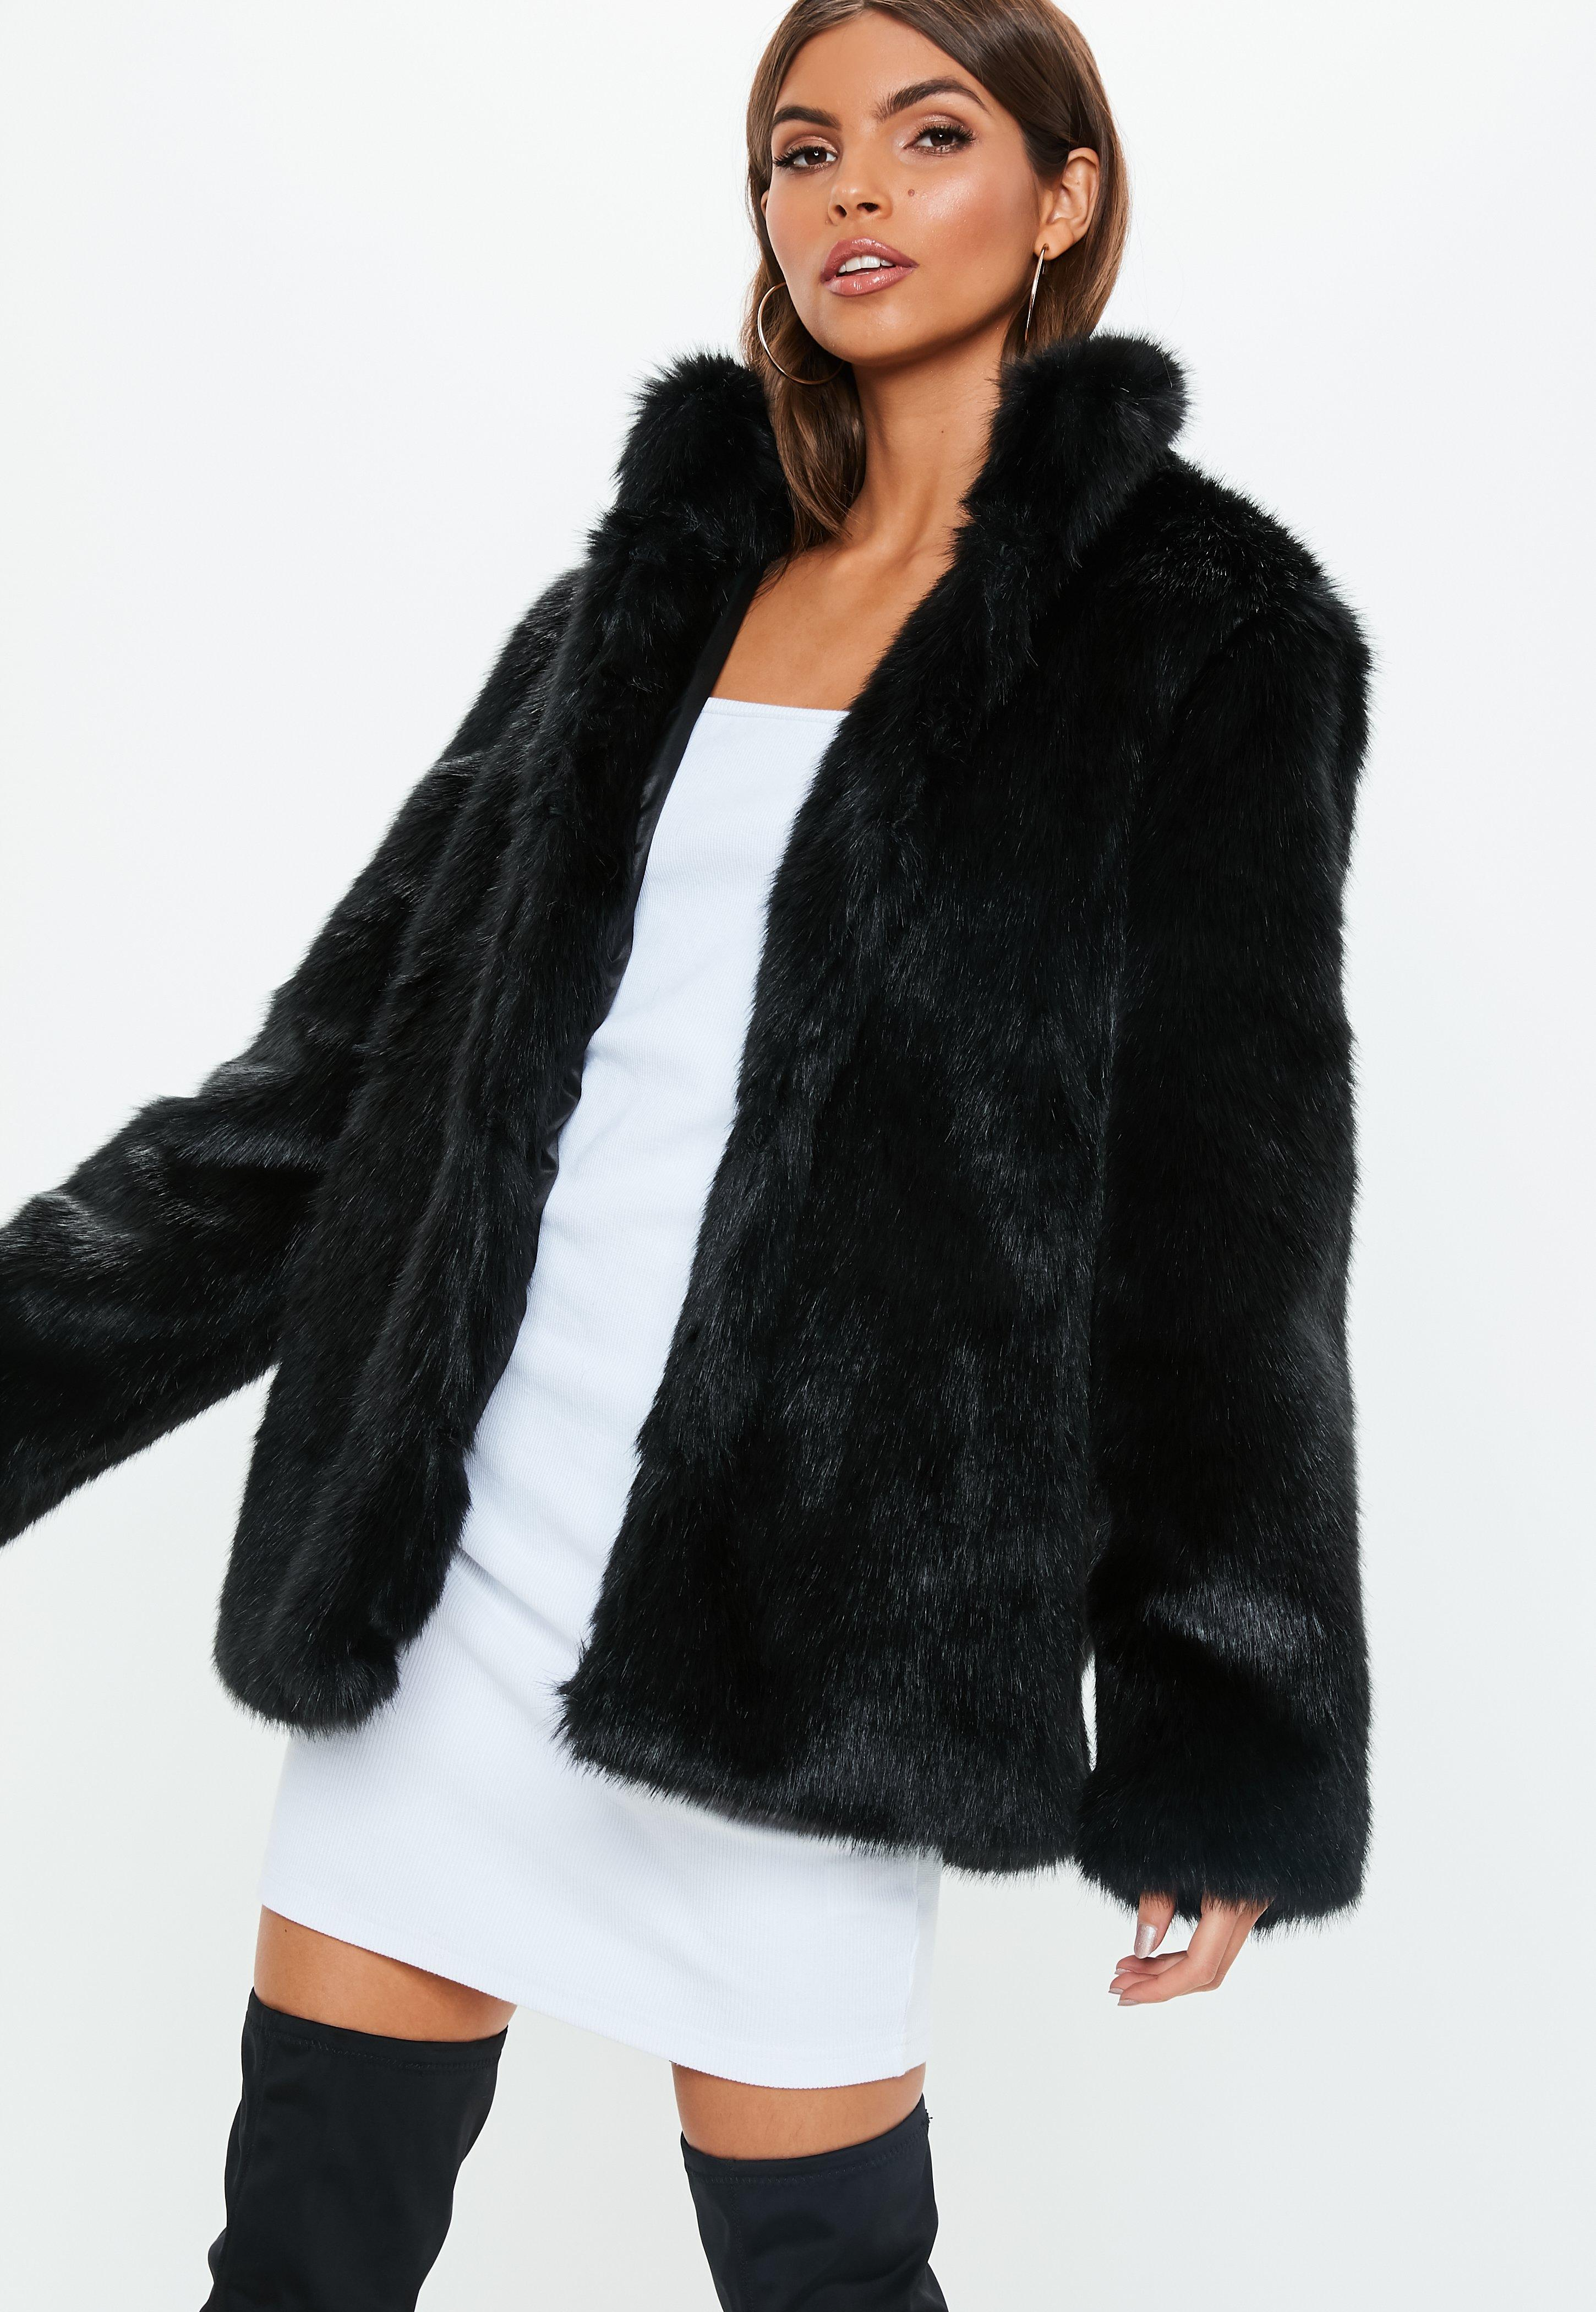 fb9b67f9577c Women s Cheap Coats